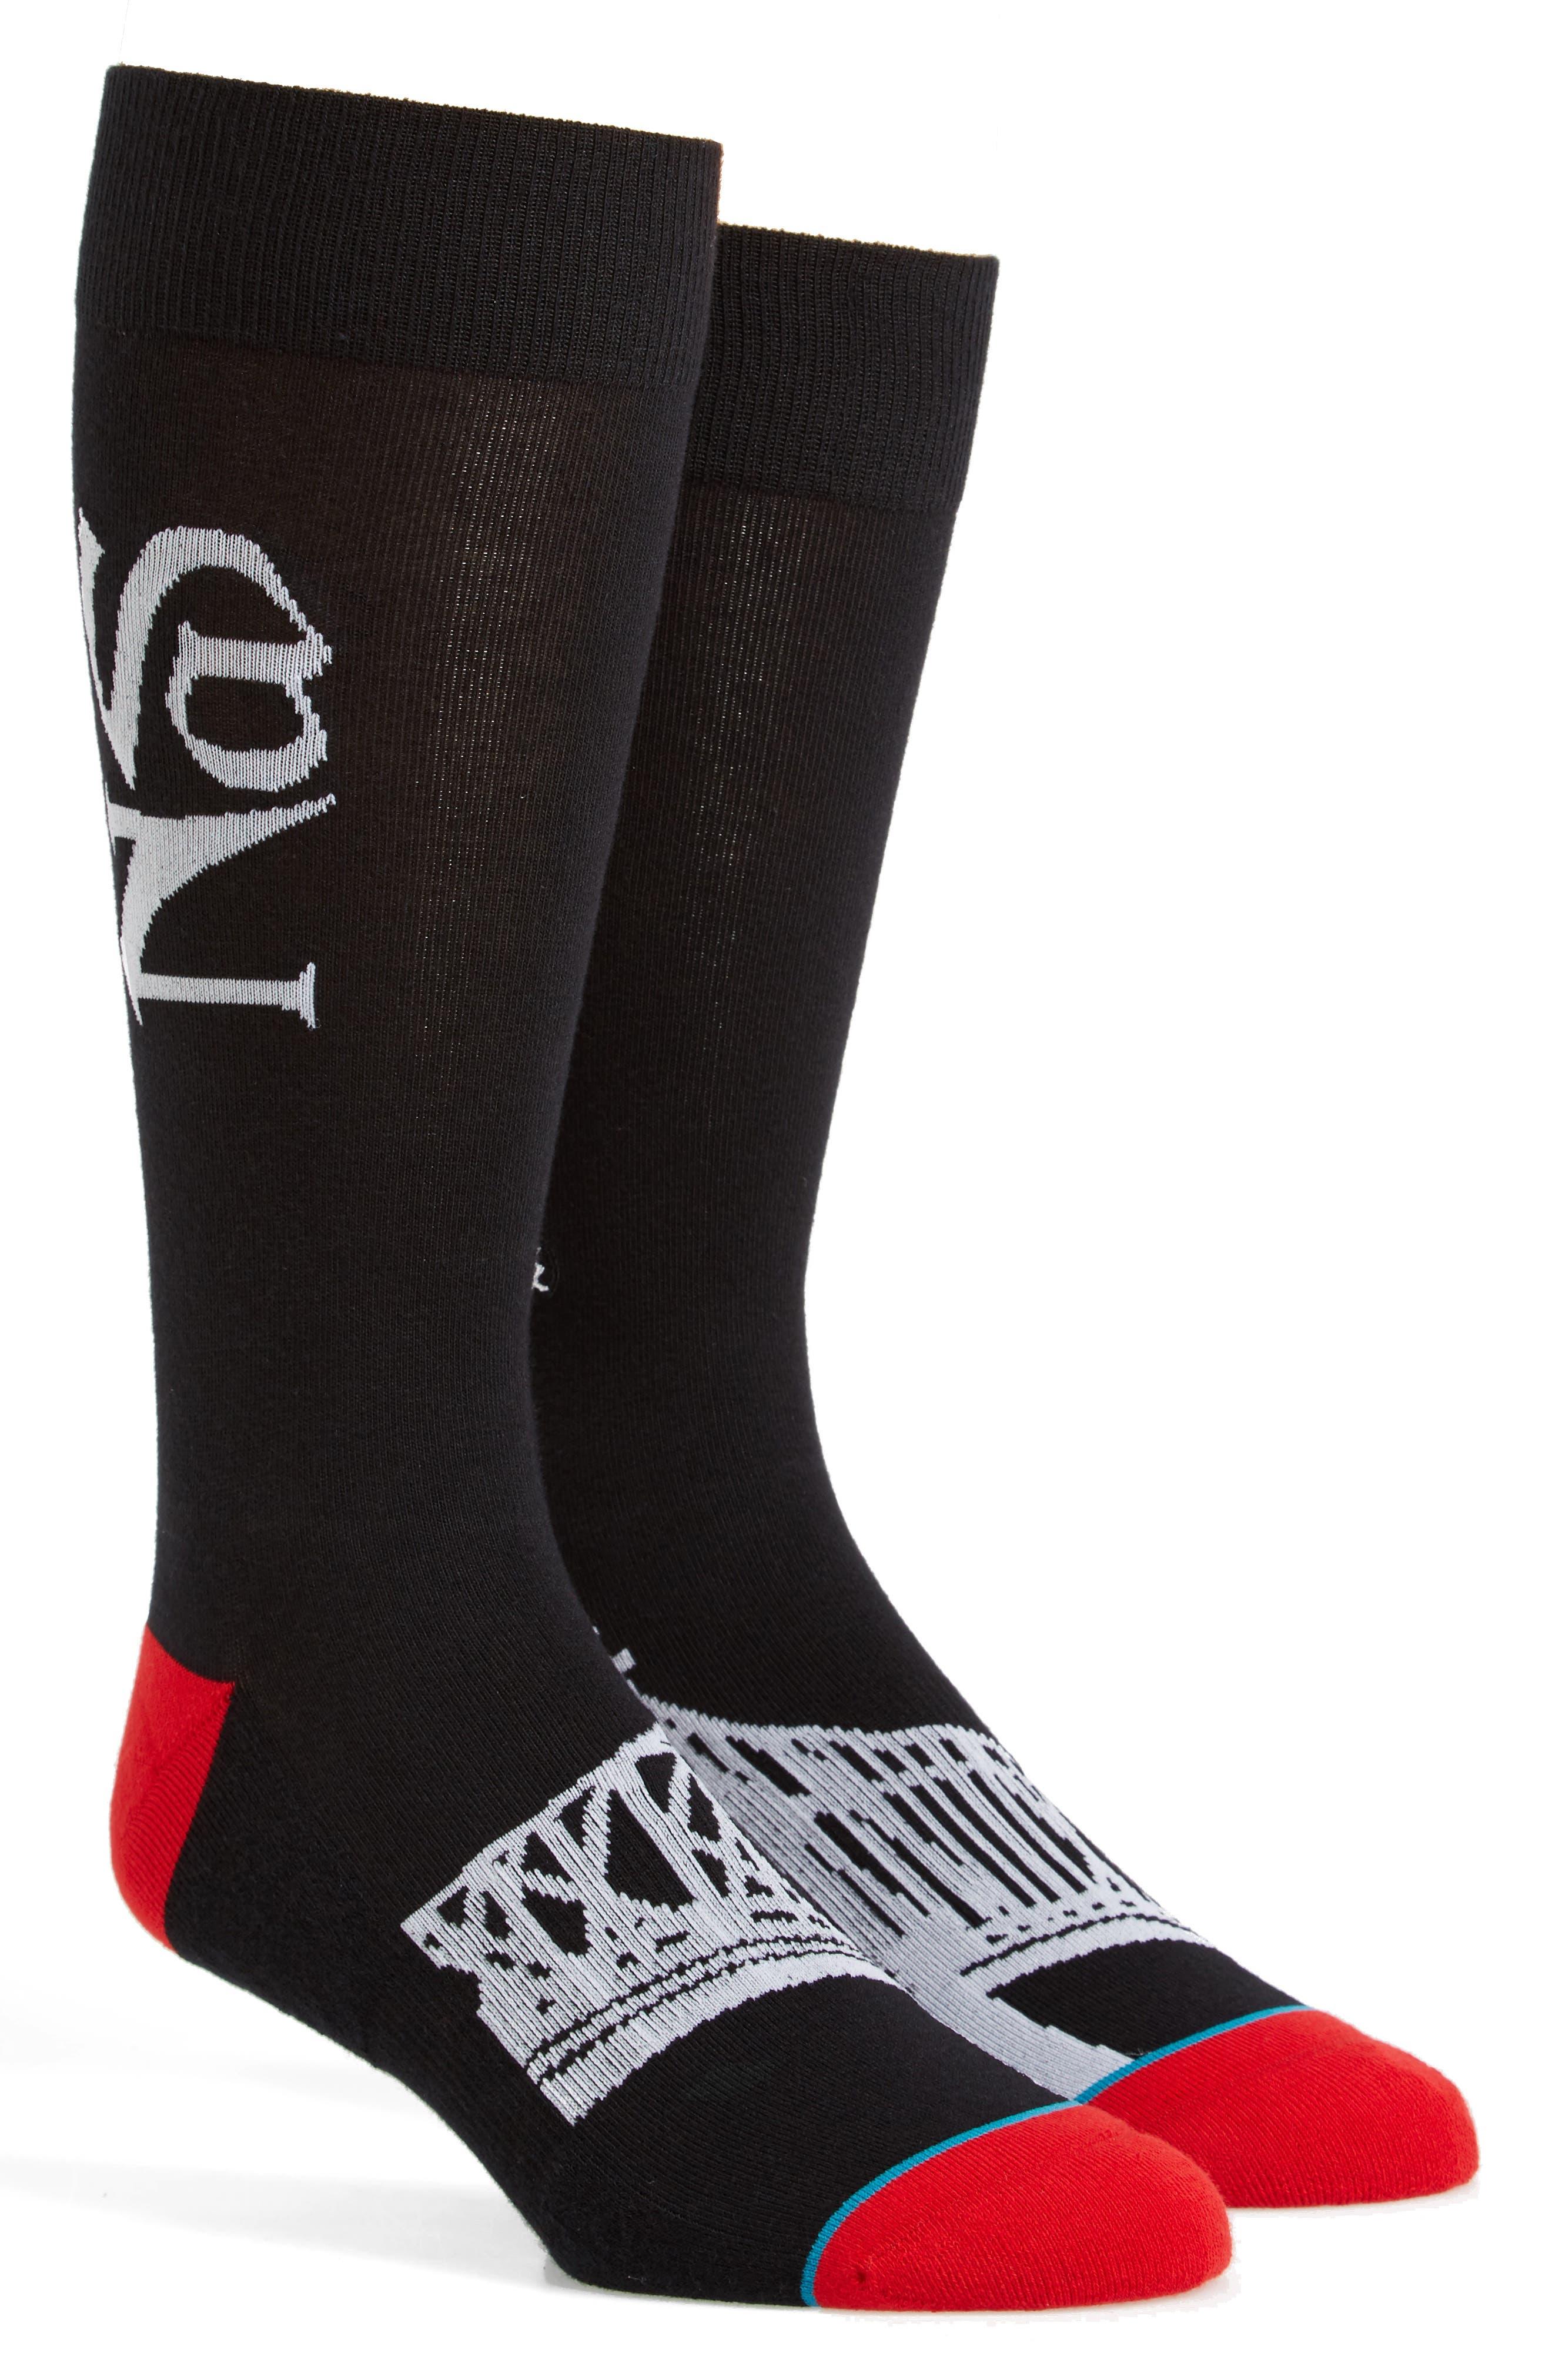 Main Image - Stance Illmatic Crew Socks